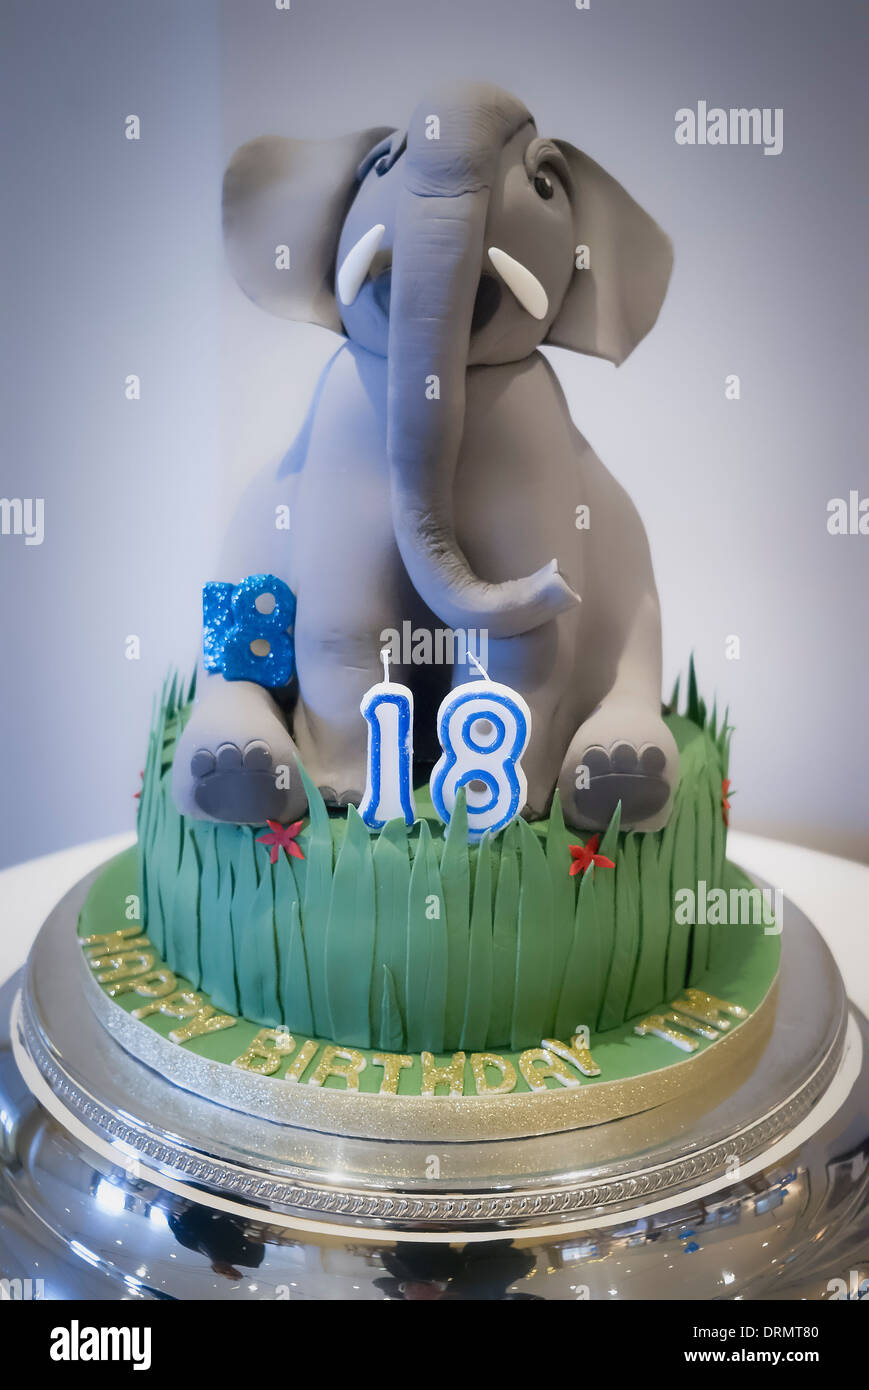 18th Birthday Cake Stock Photos 18th Birthday Cake Stock Images